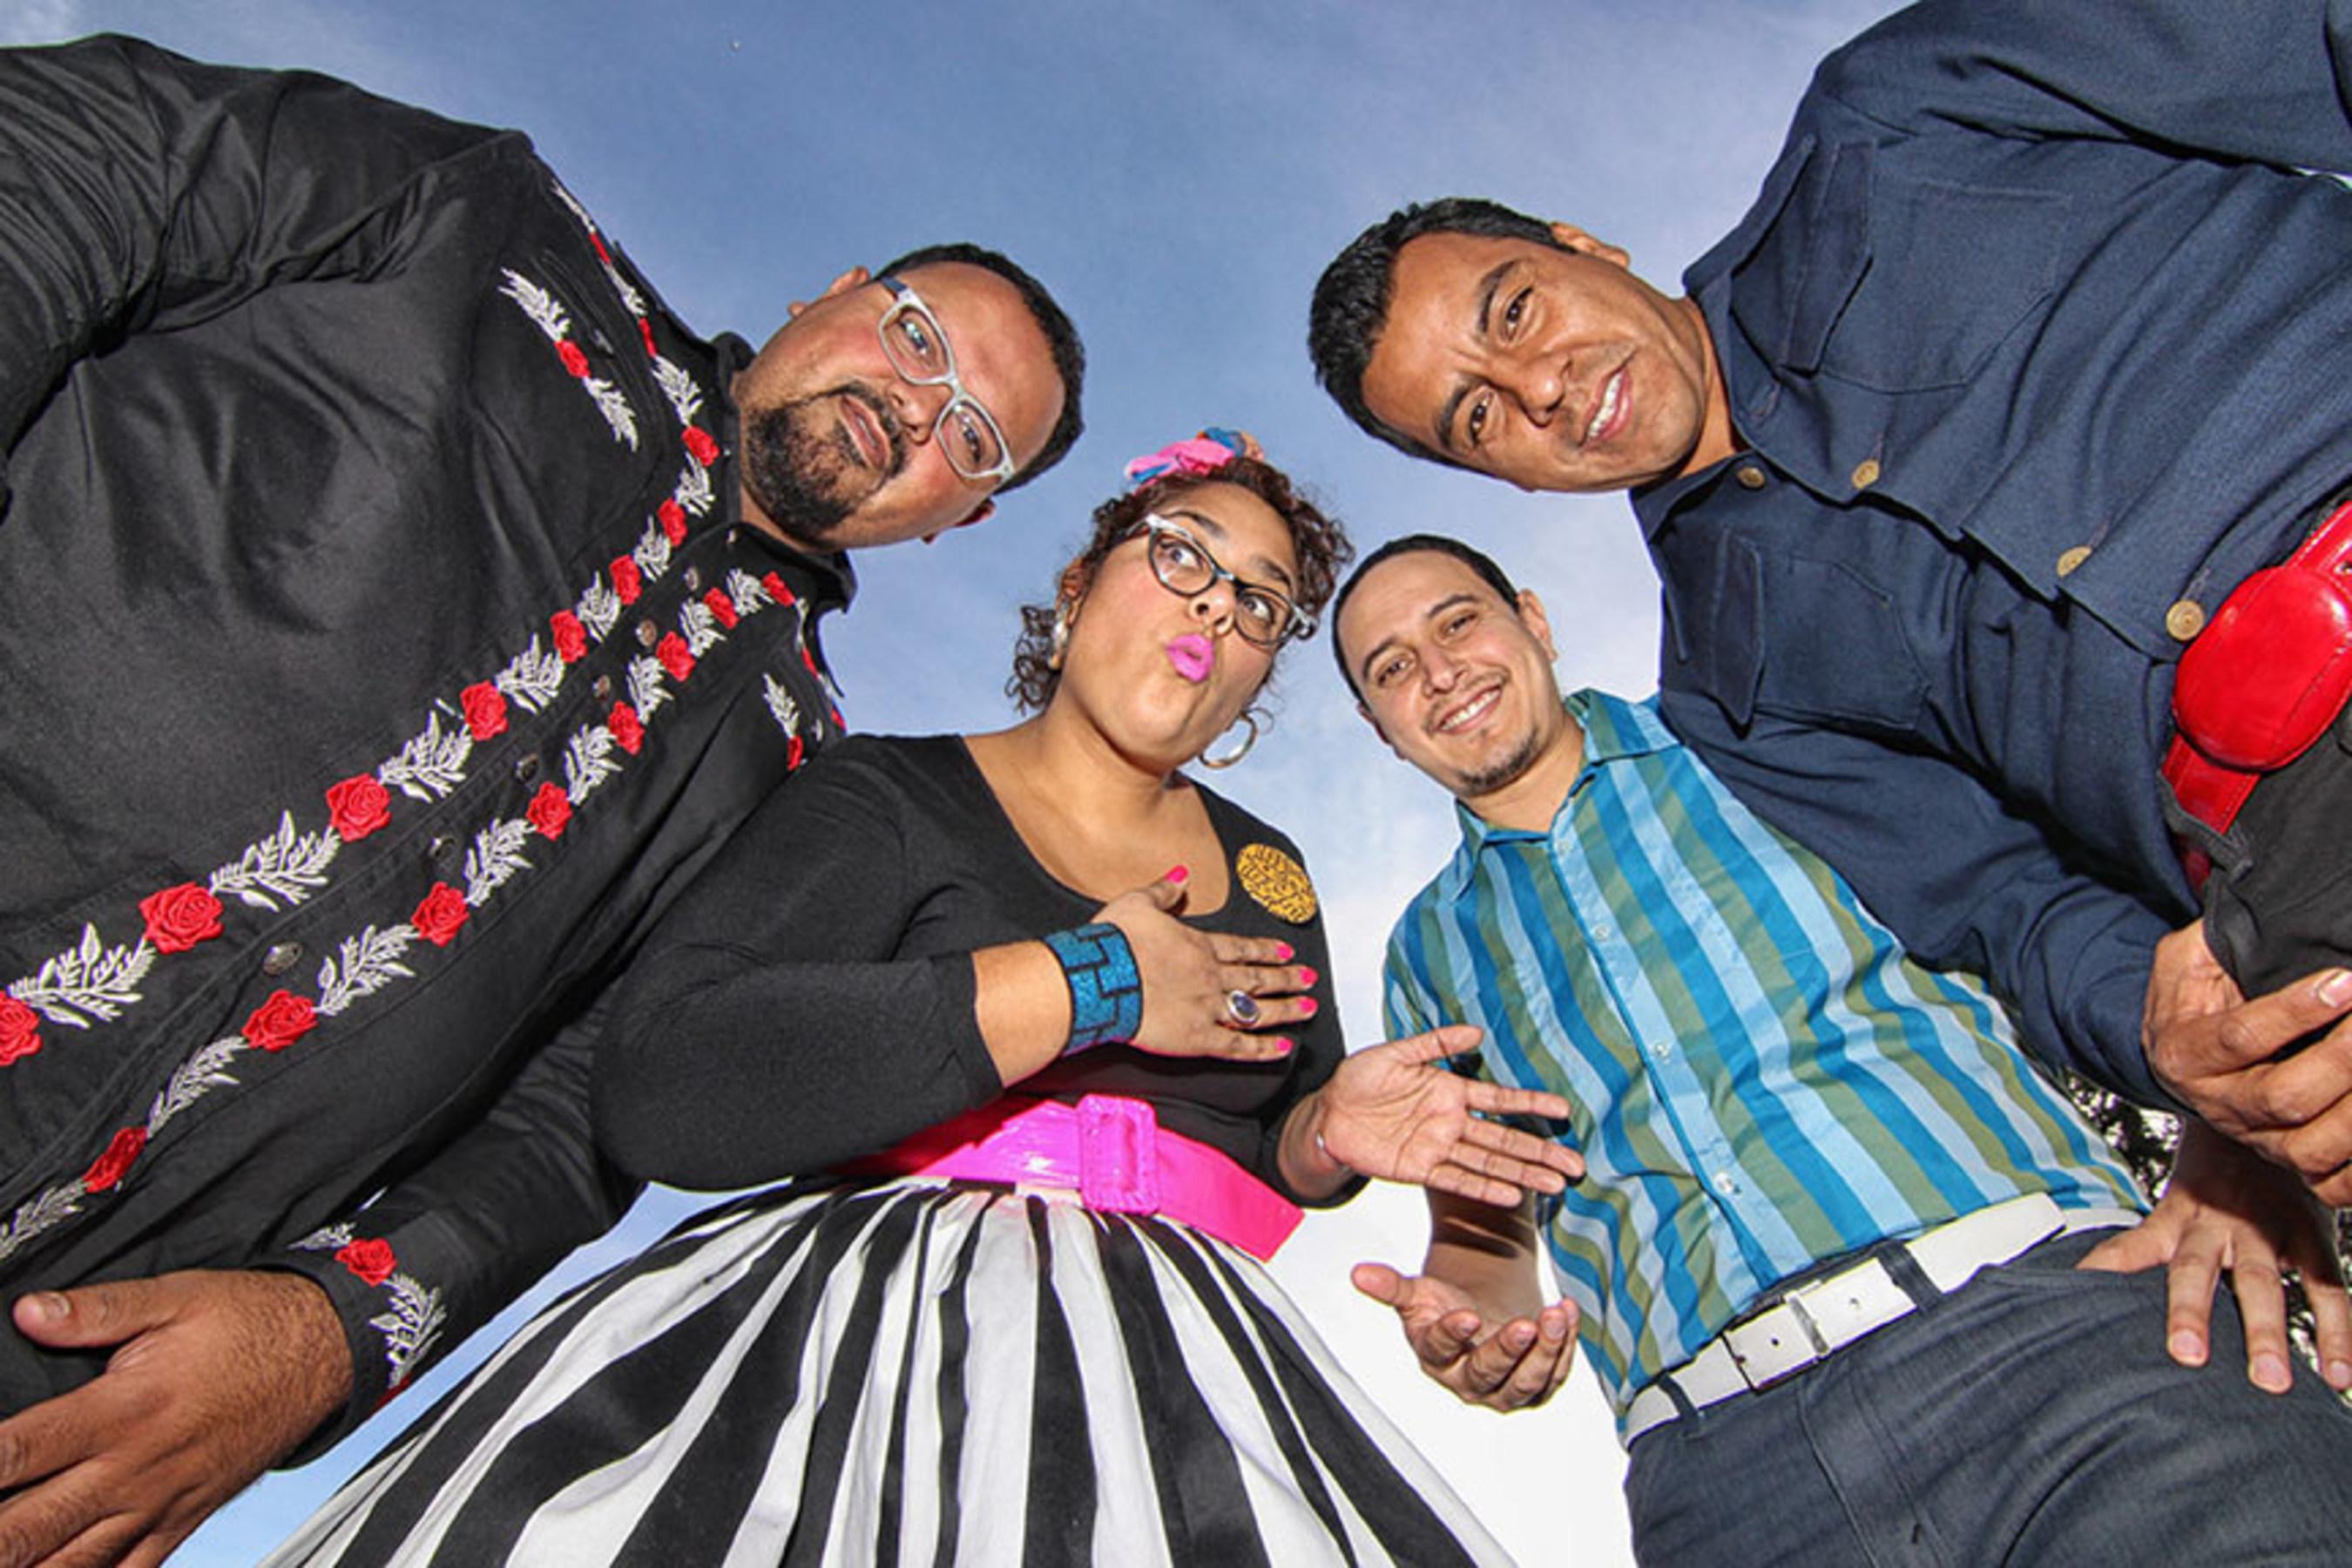 Grammy Award Winners La Santa Cecilia to Perform at CHCI's 38th Annual Awards Gala in Washington, D.C